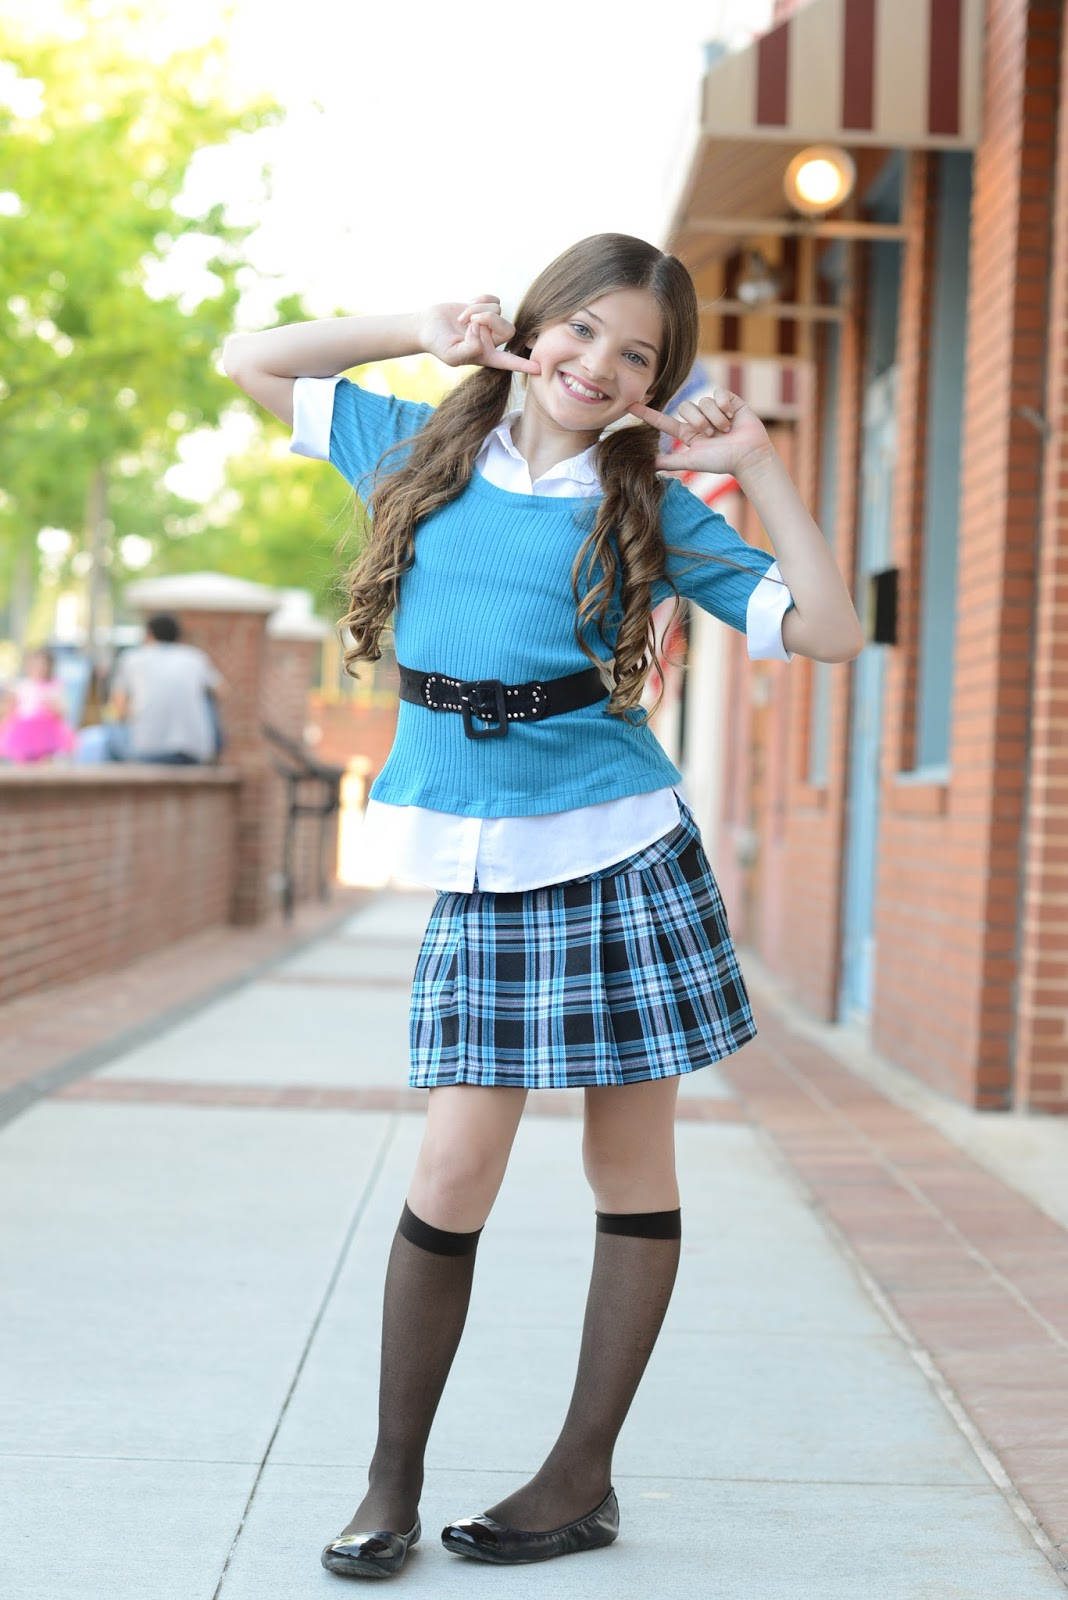 Uphyd school gym uniforms navy style teen girls sleeveless sailor suits summer school dress